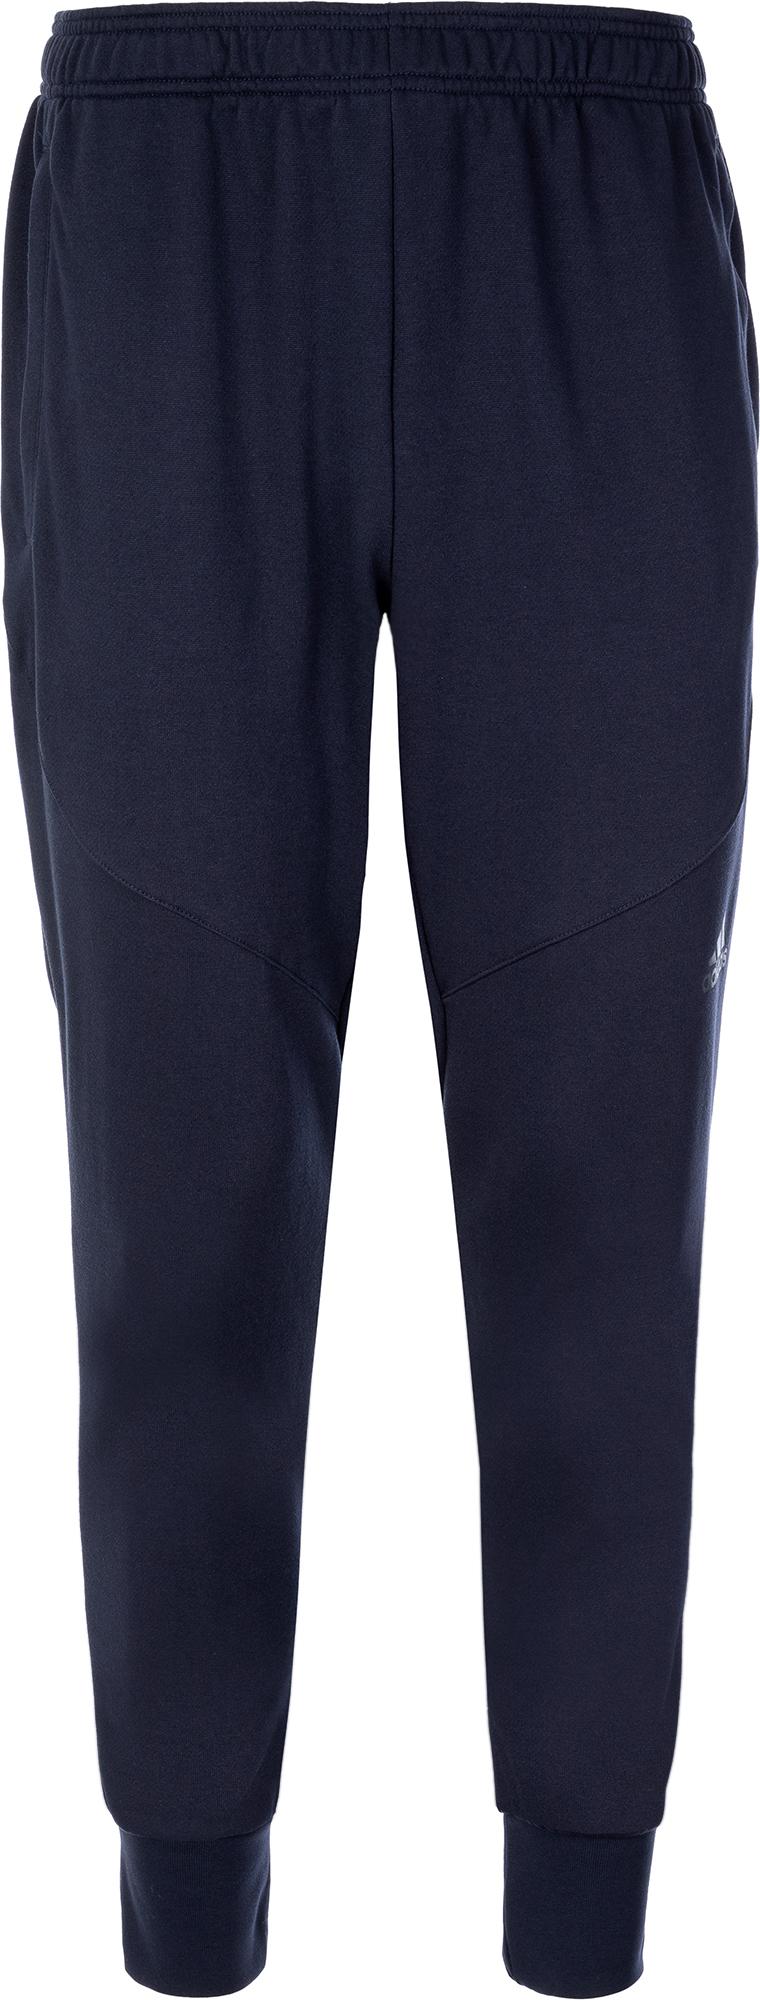 Adidas Брюки мужские Prime Workout, размер 54